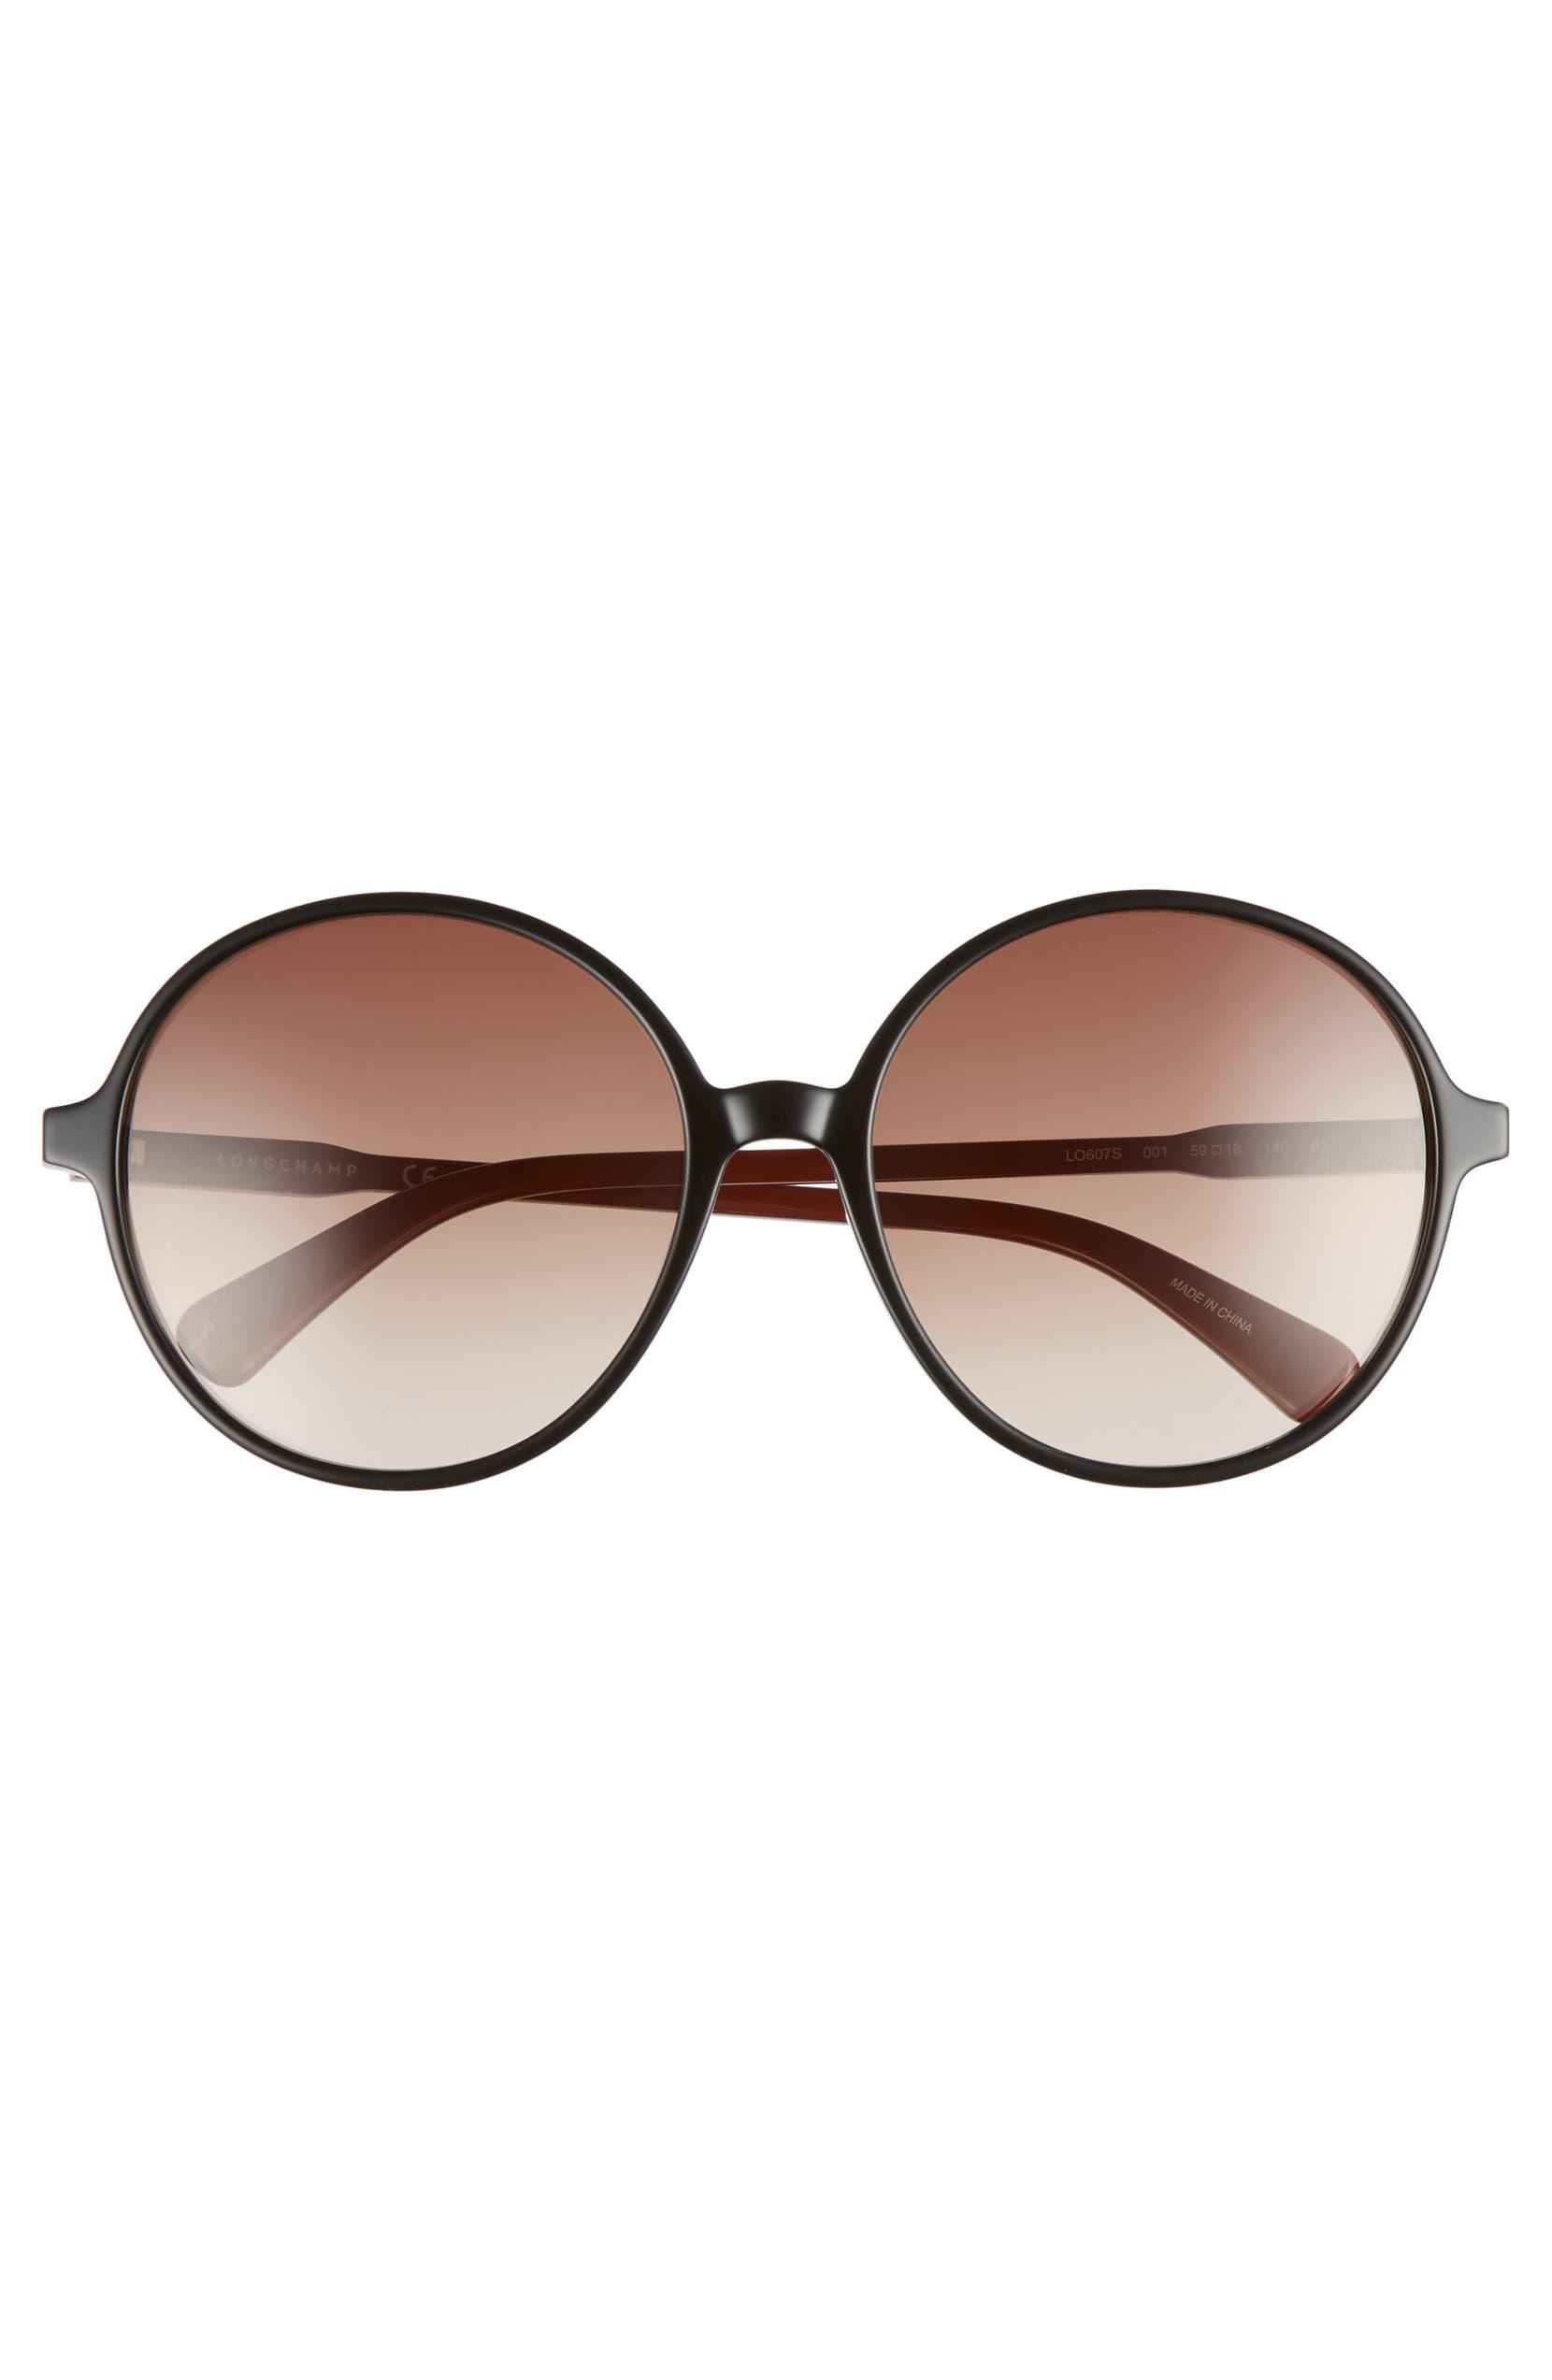 f713dbc079 Longchamp 49mm Gradient Round Sunglasses